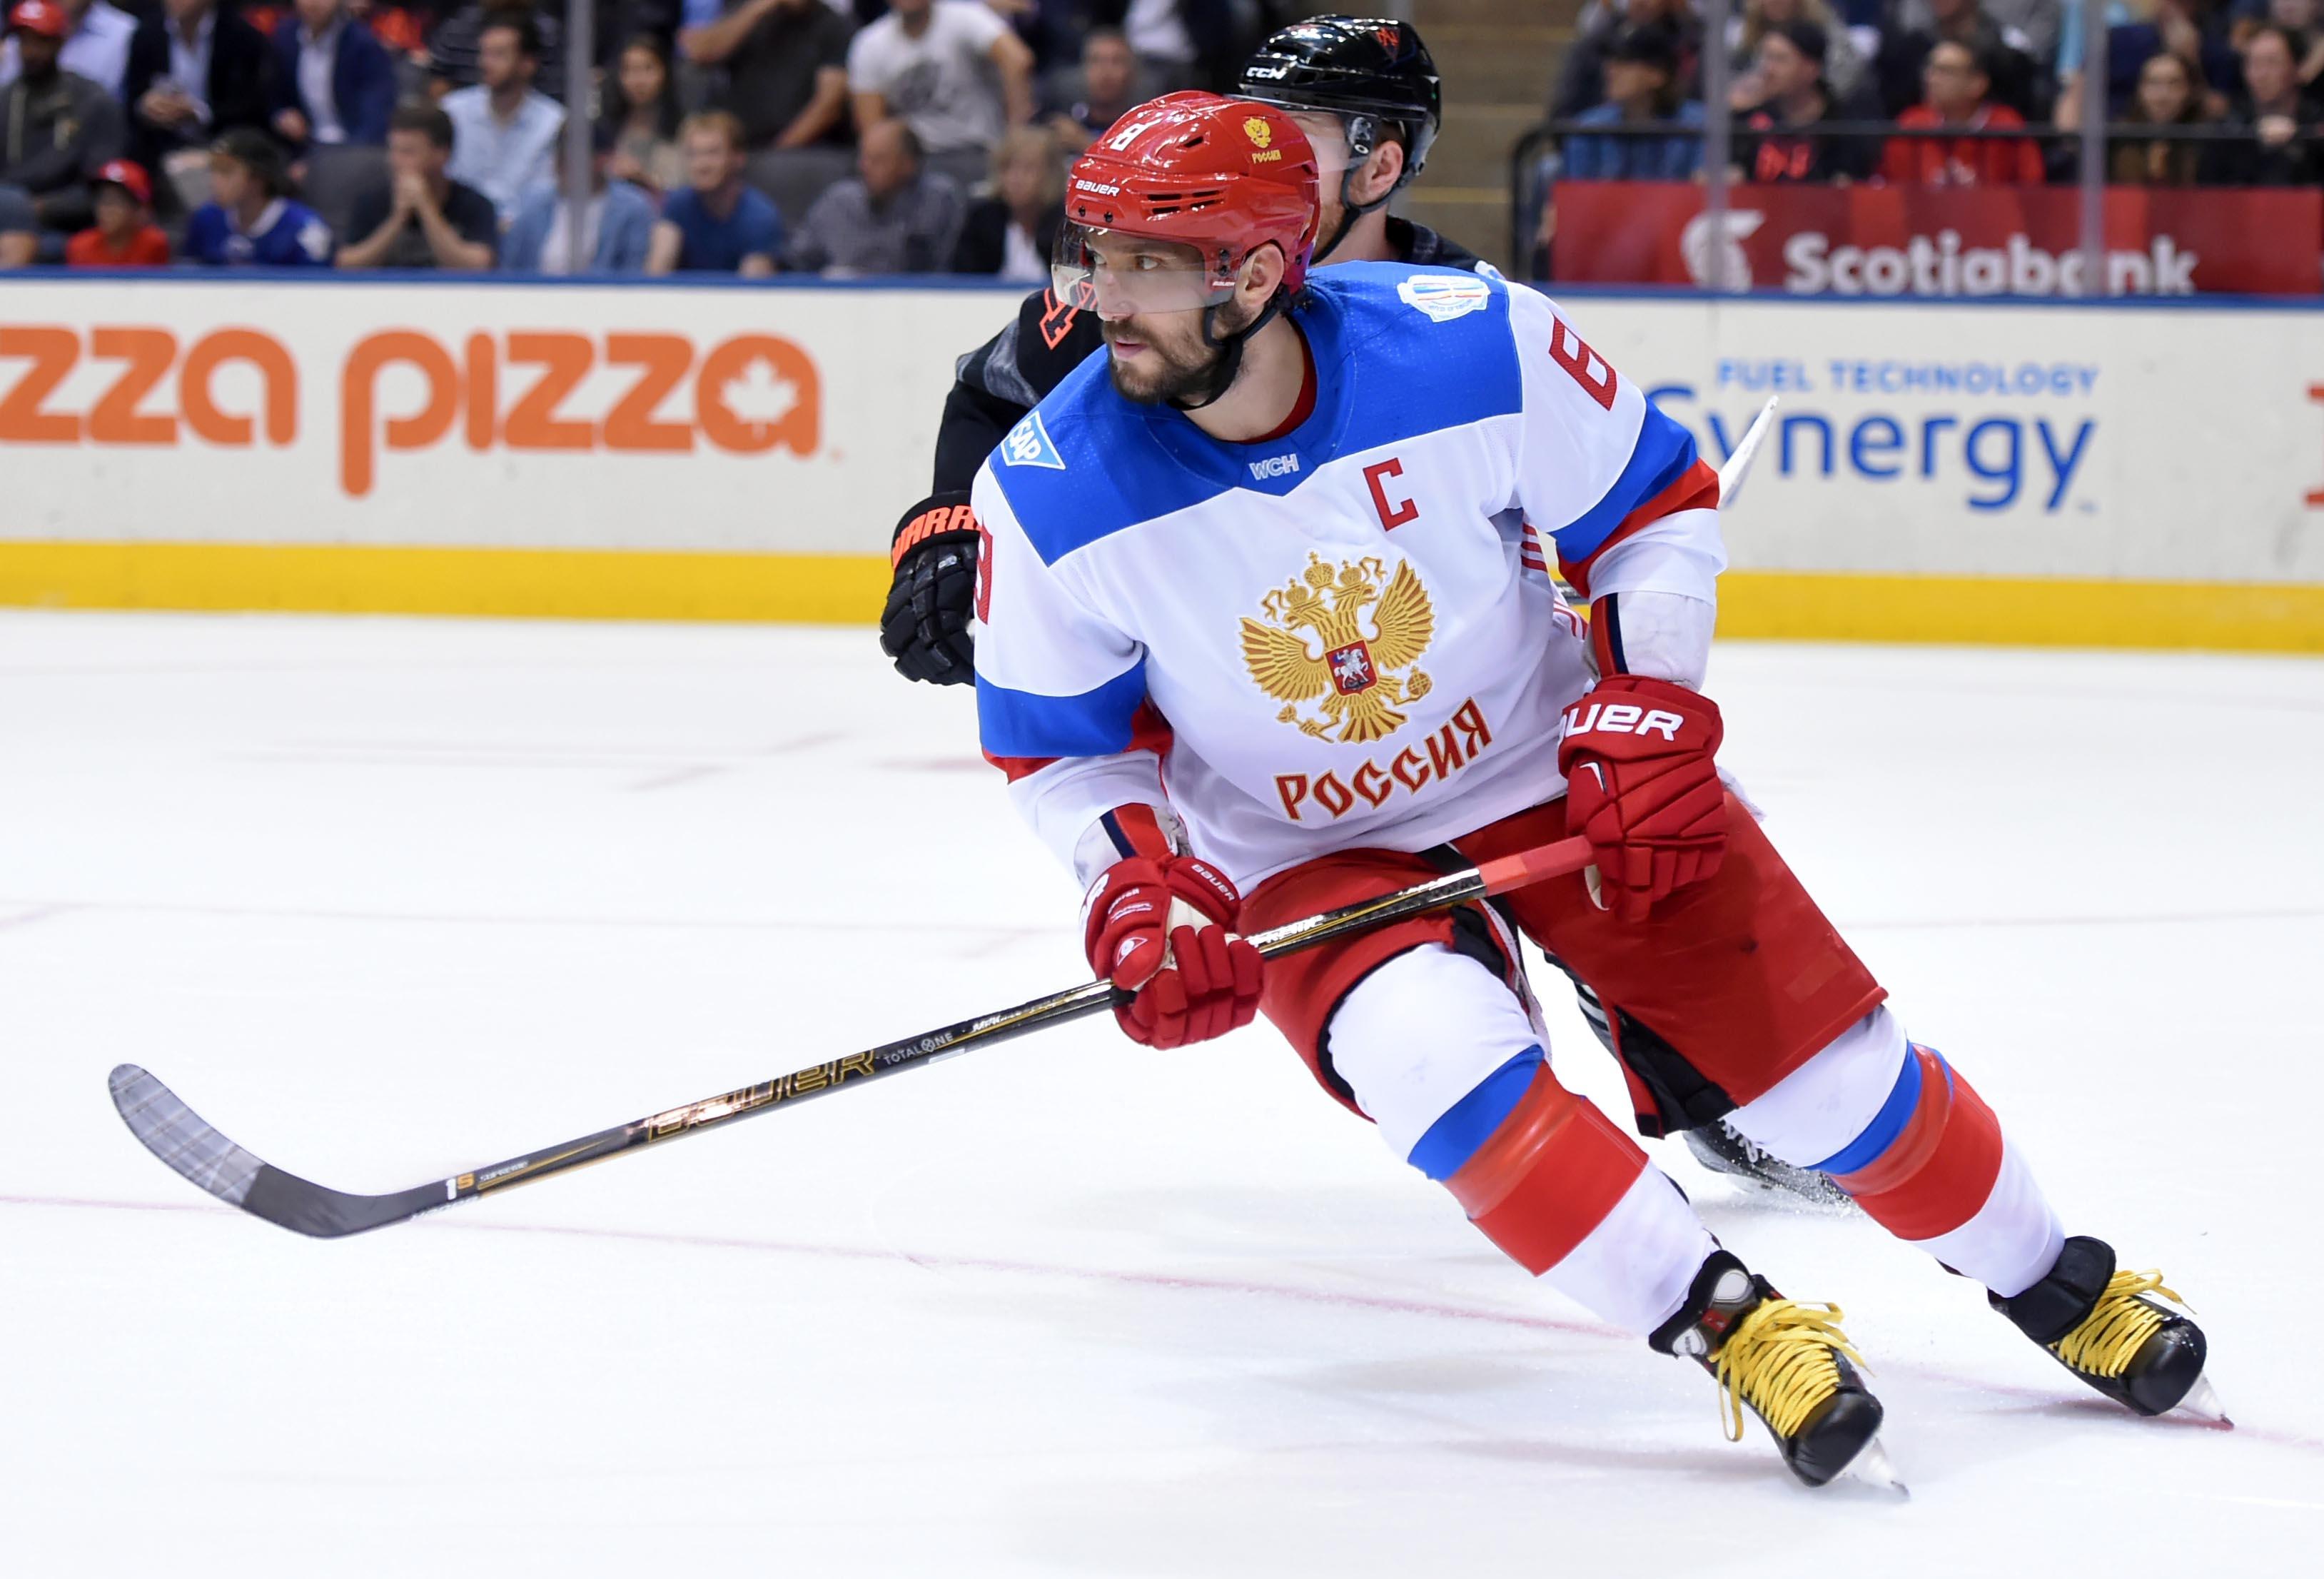 9554069-hockey-world-cup-of-hockey-team-north-america-vs-team-russia